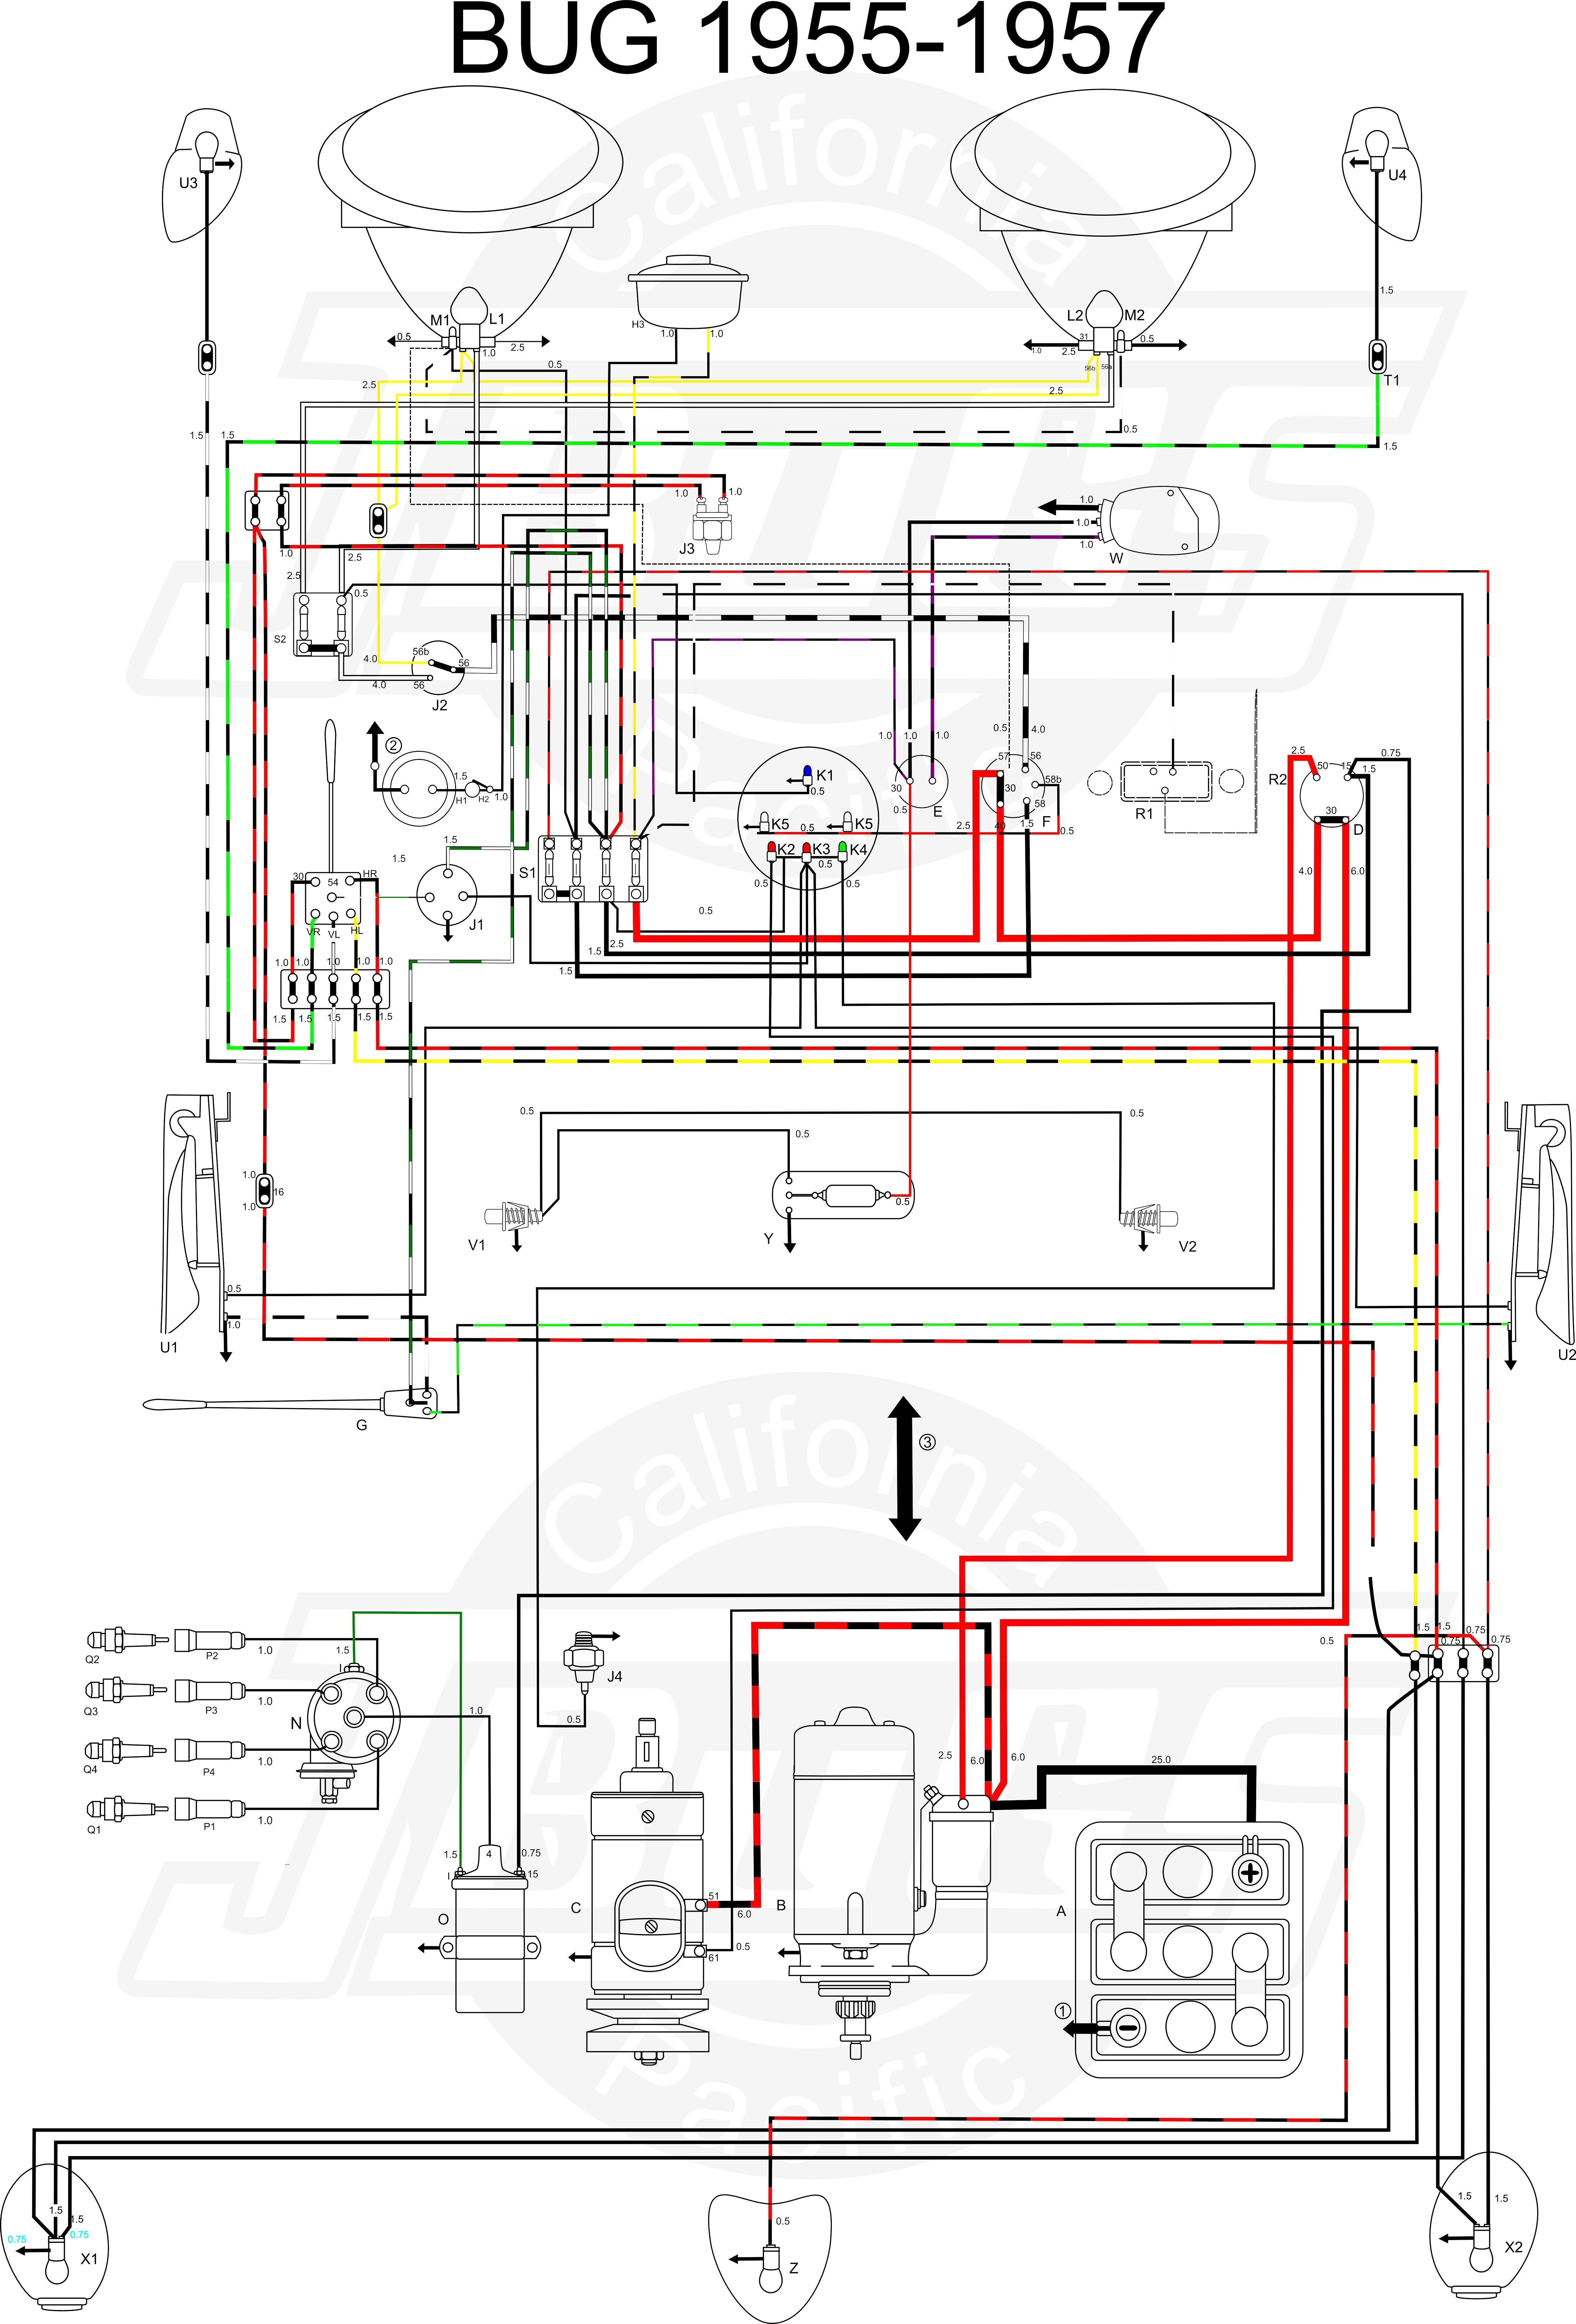 Vw Tech Article 1955 57 Wiring Diagram V Dubs Vw Parts Diagram Dune Buggy Engine Parts List Schematics Drawings